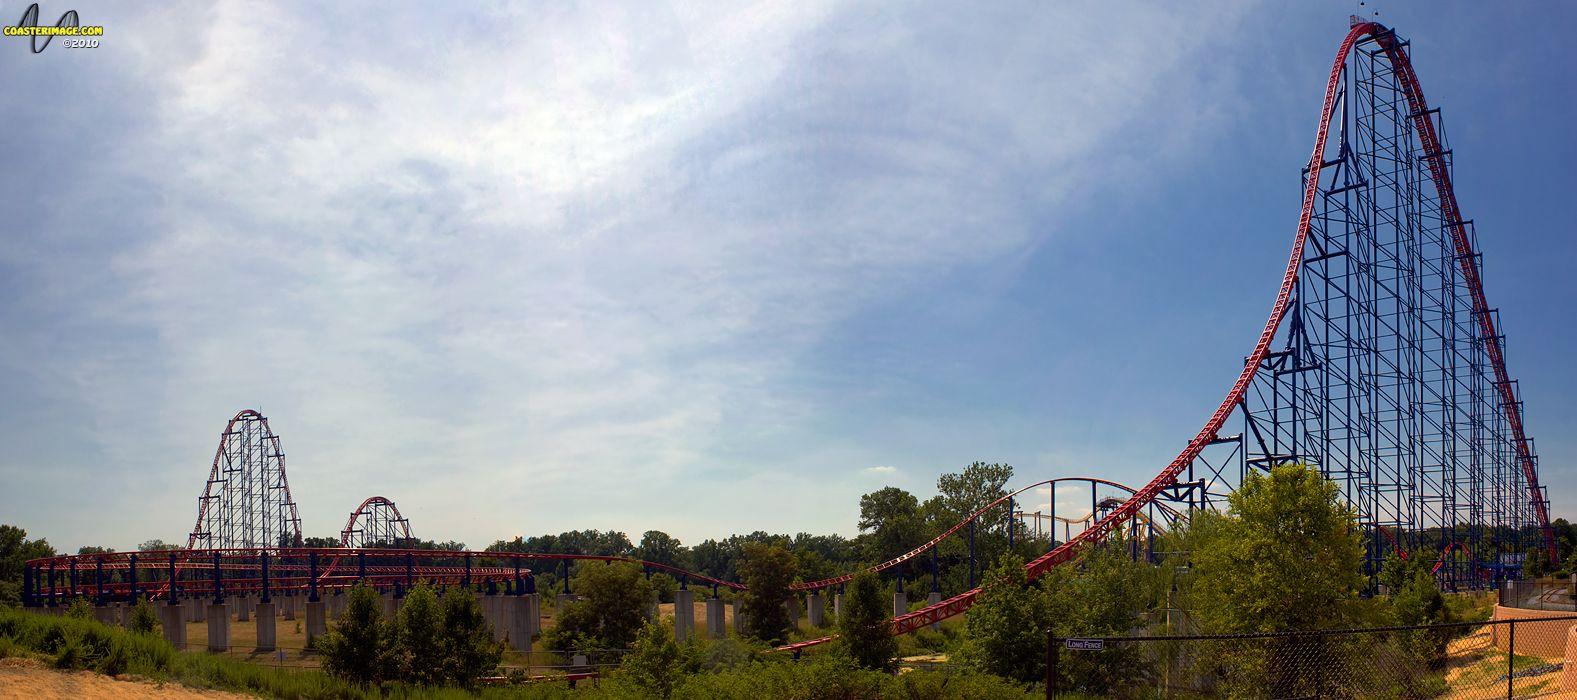 Superman Ride Of Steel Six Flags Amusement Park Rides Orlando Theme Parks Darien Lake